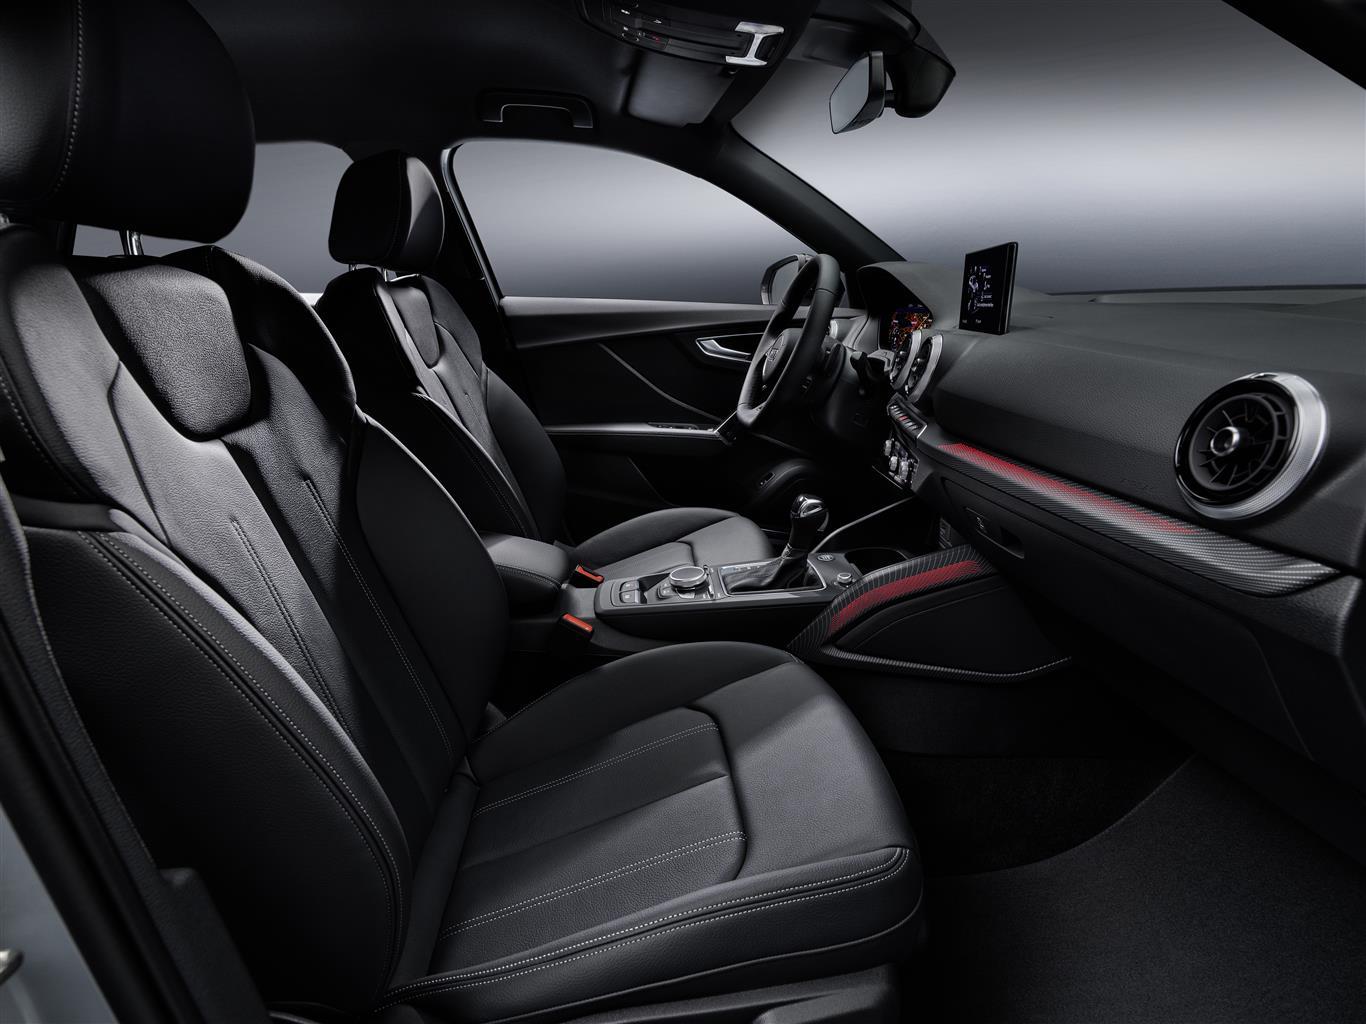 Audi Q2 Interni 2